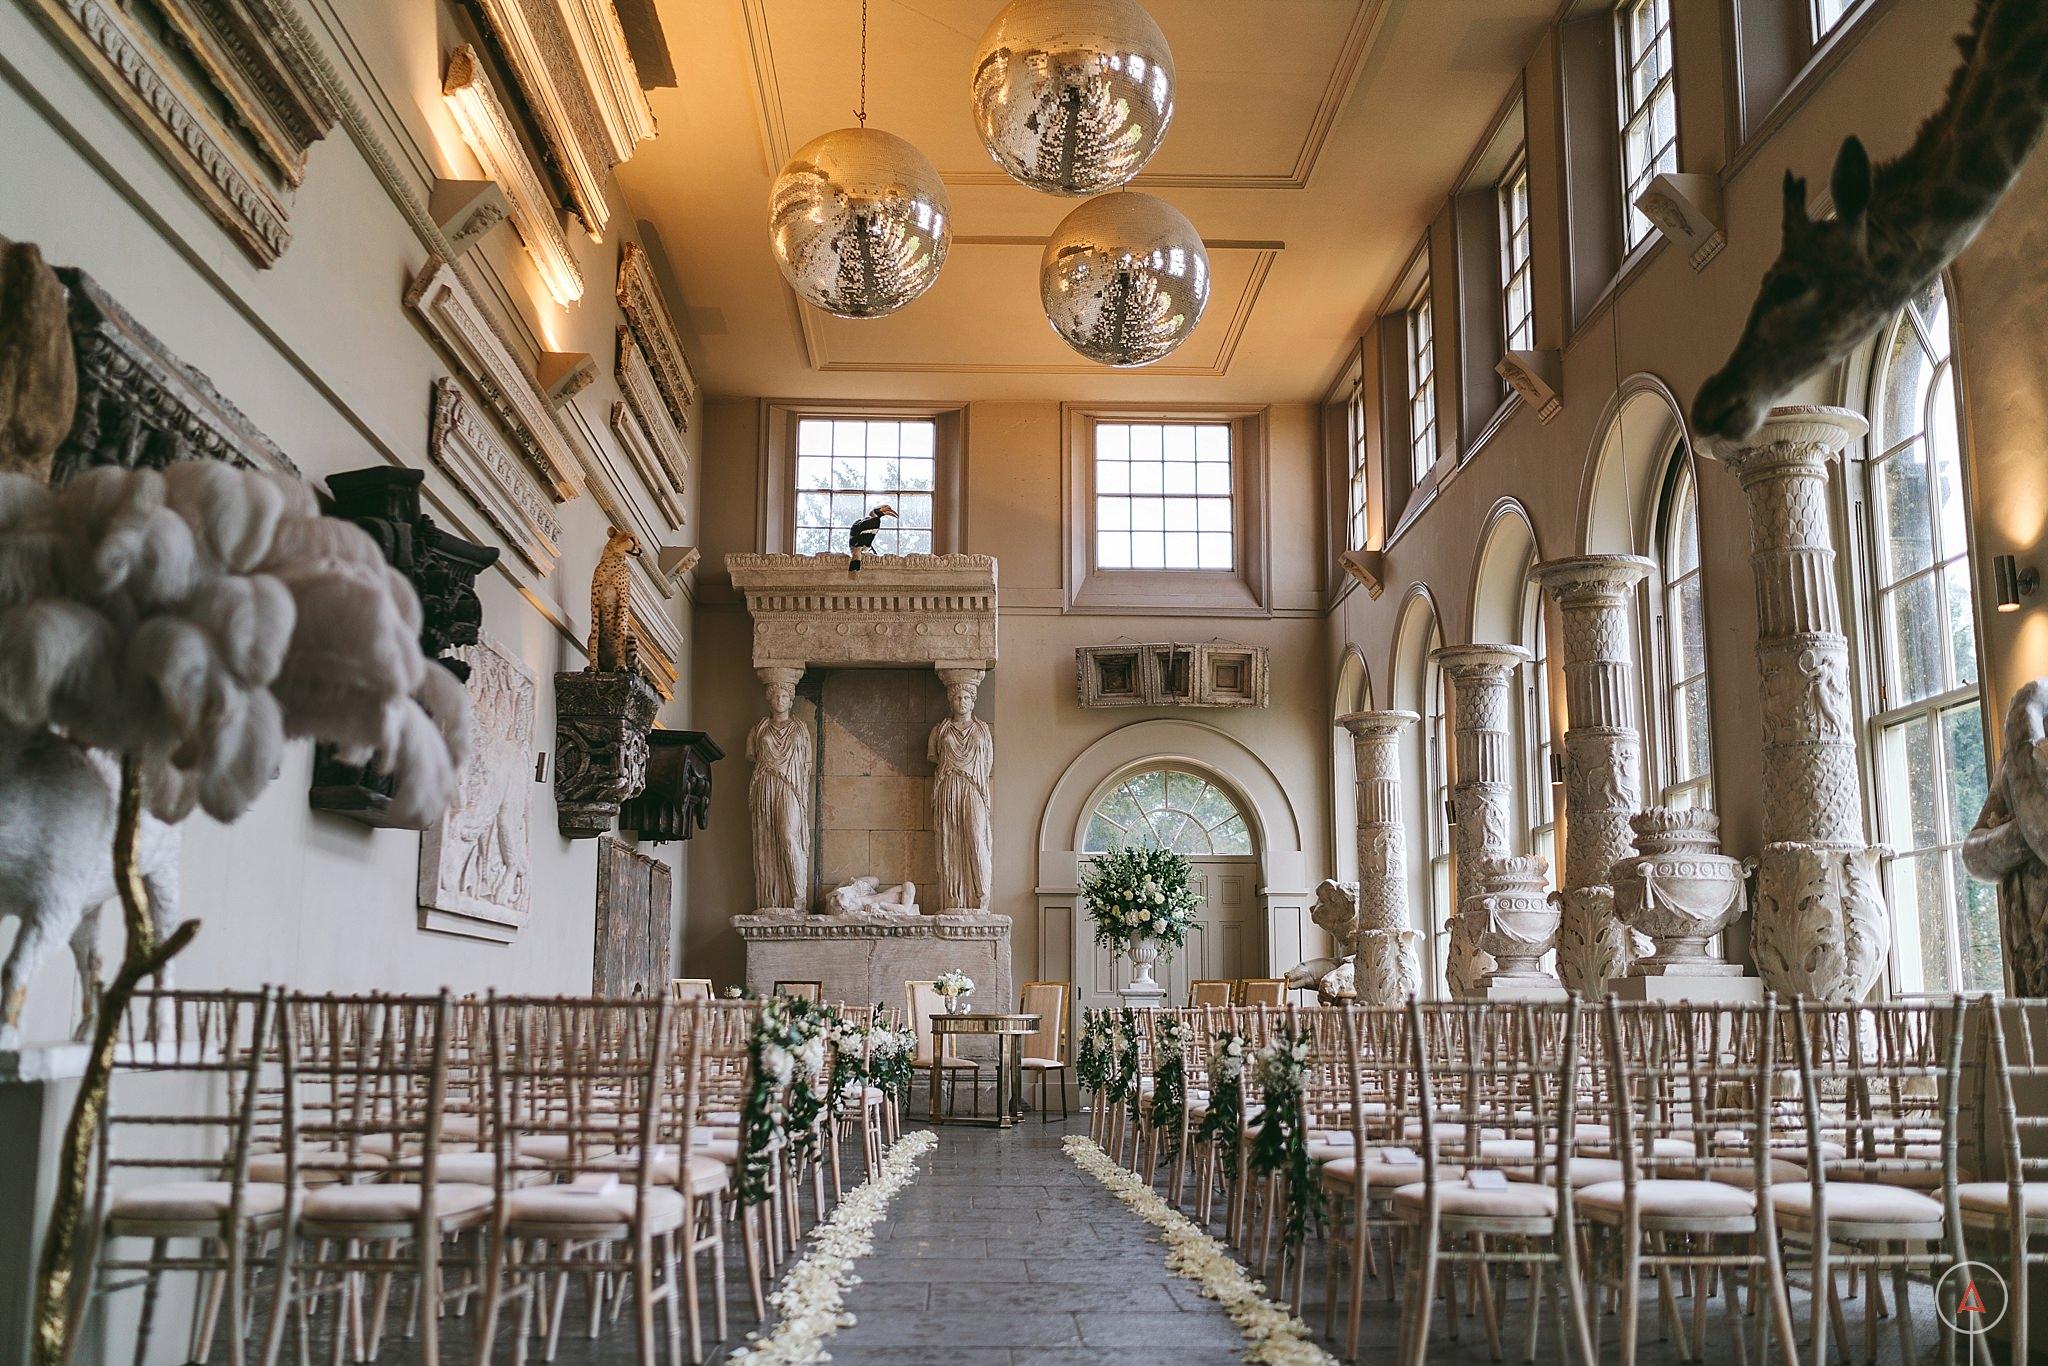 cardiff-wedding-photographer-aga-tomaszek_0204